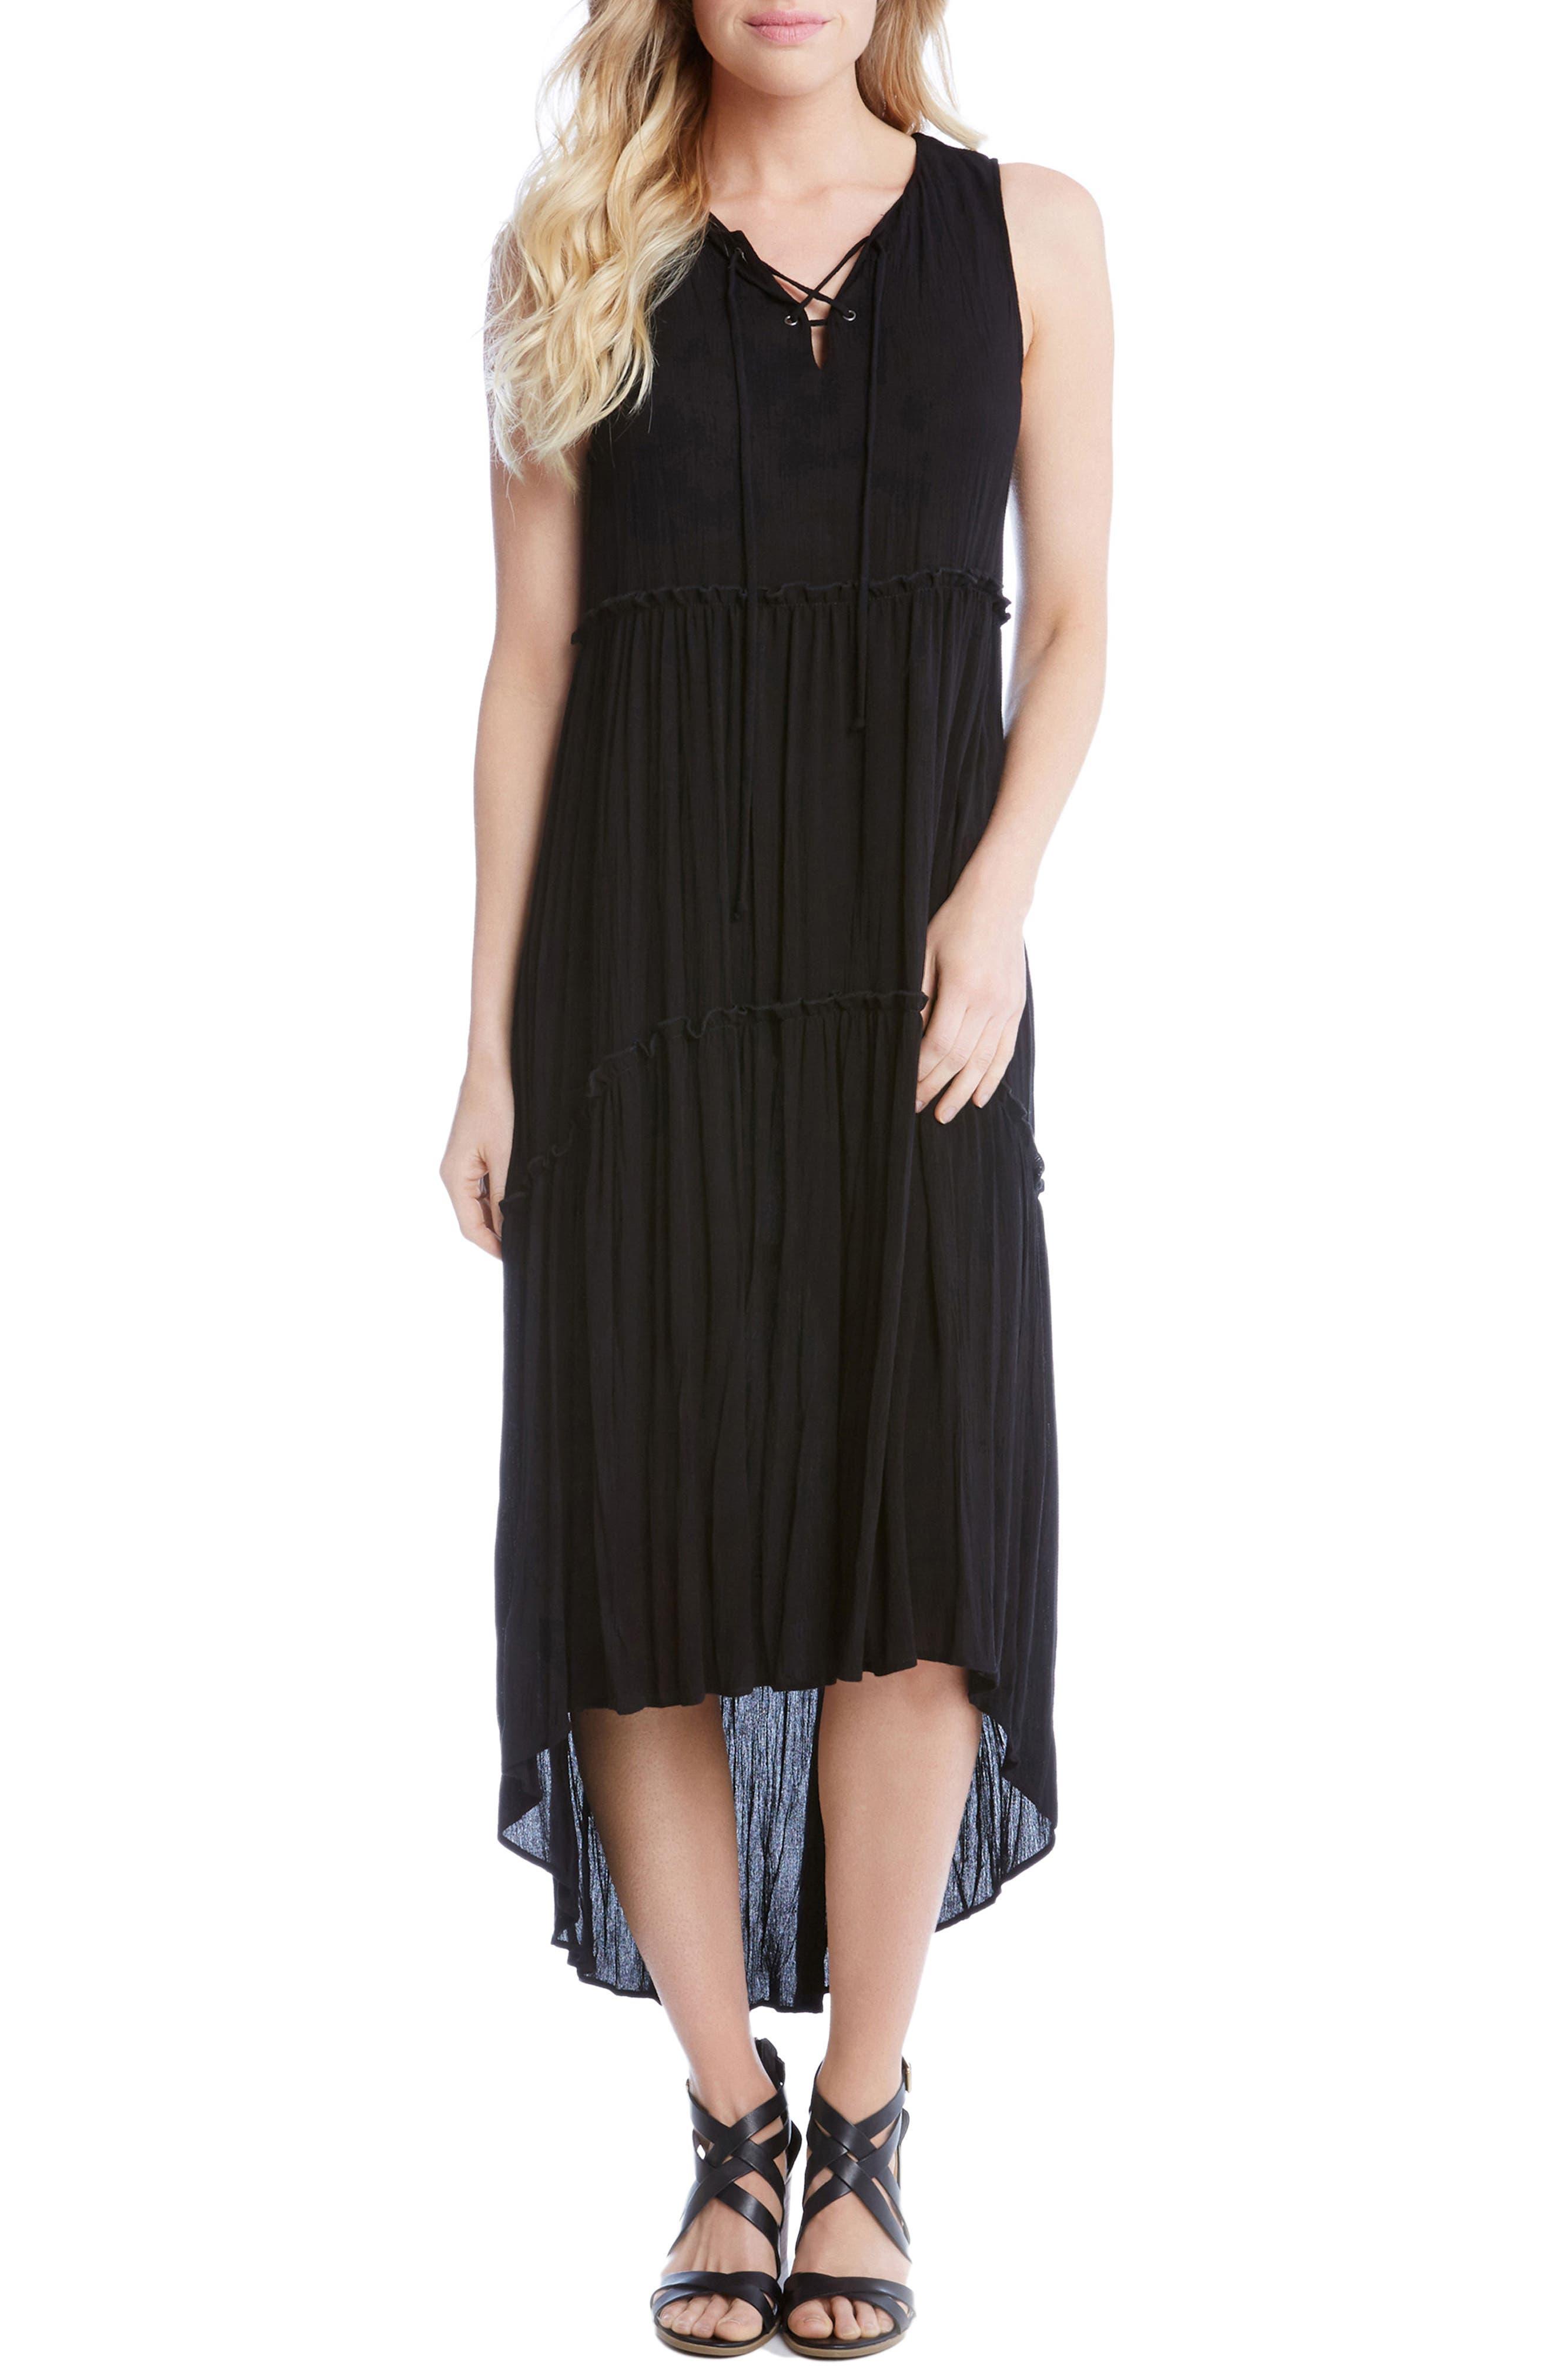 Alternate Image 1 Selected - Karen Kane Lace-Up Tiered High/Low Dress